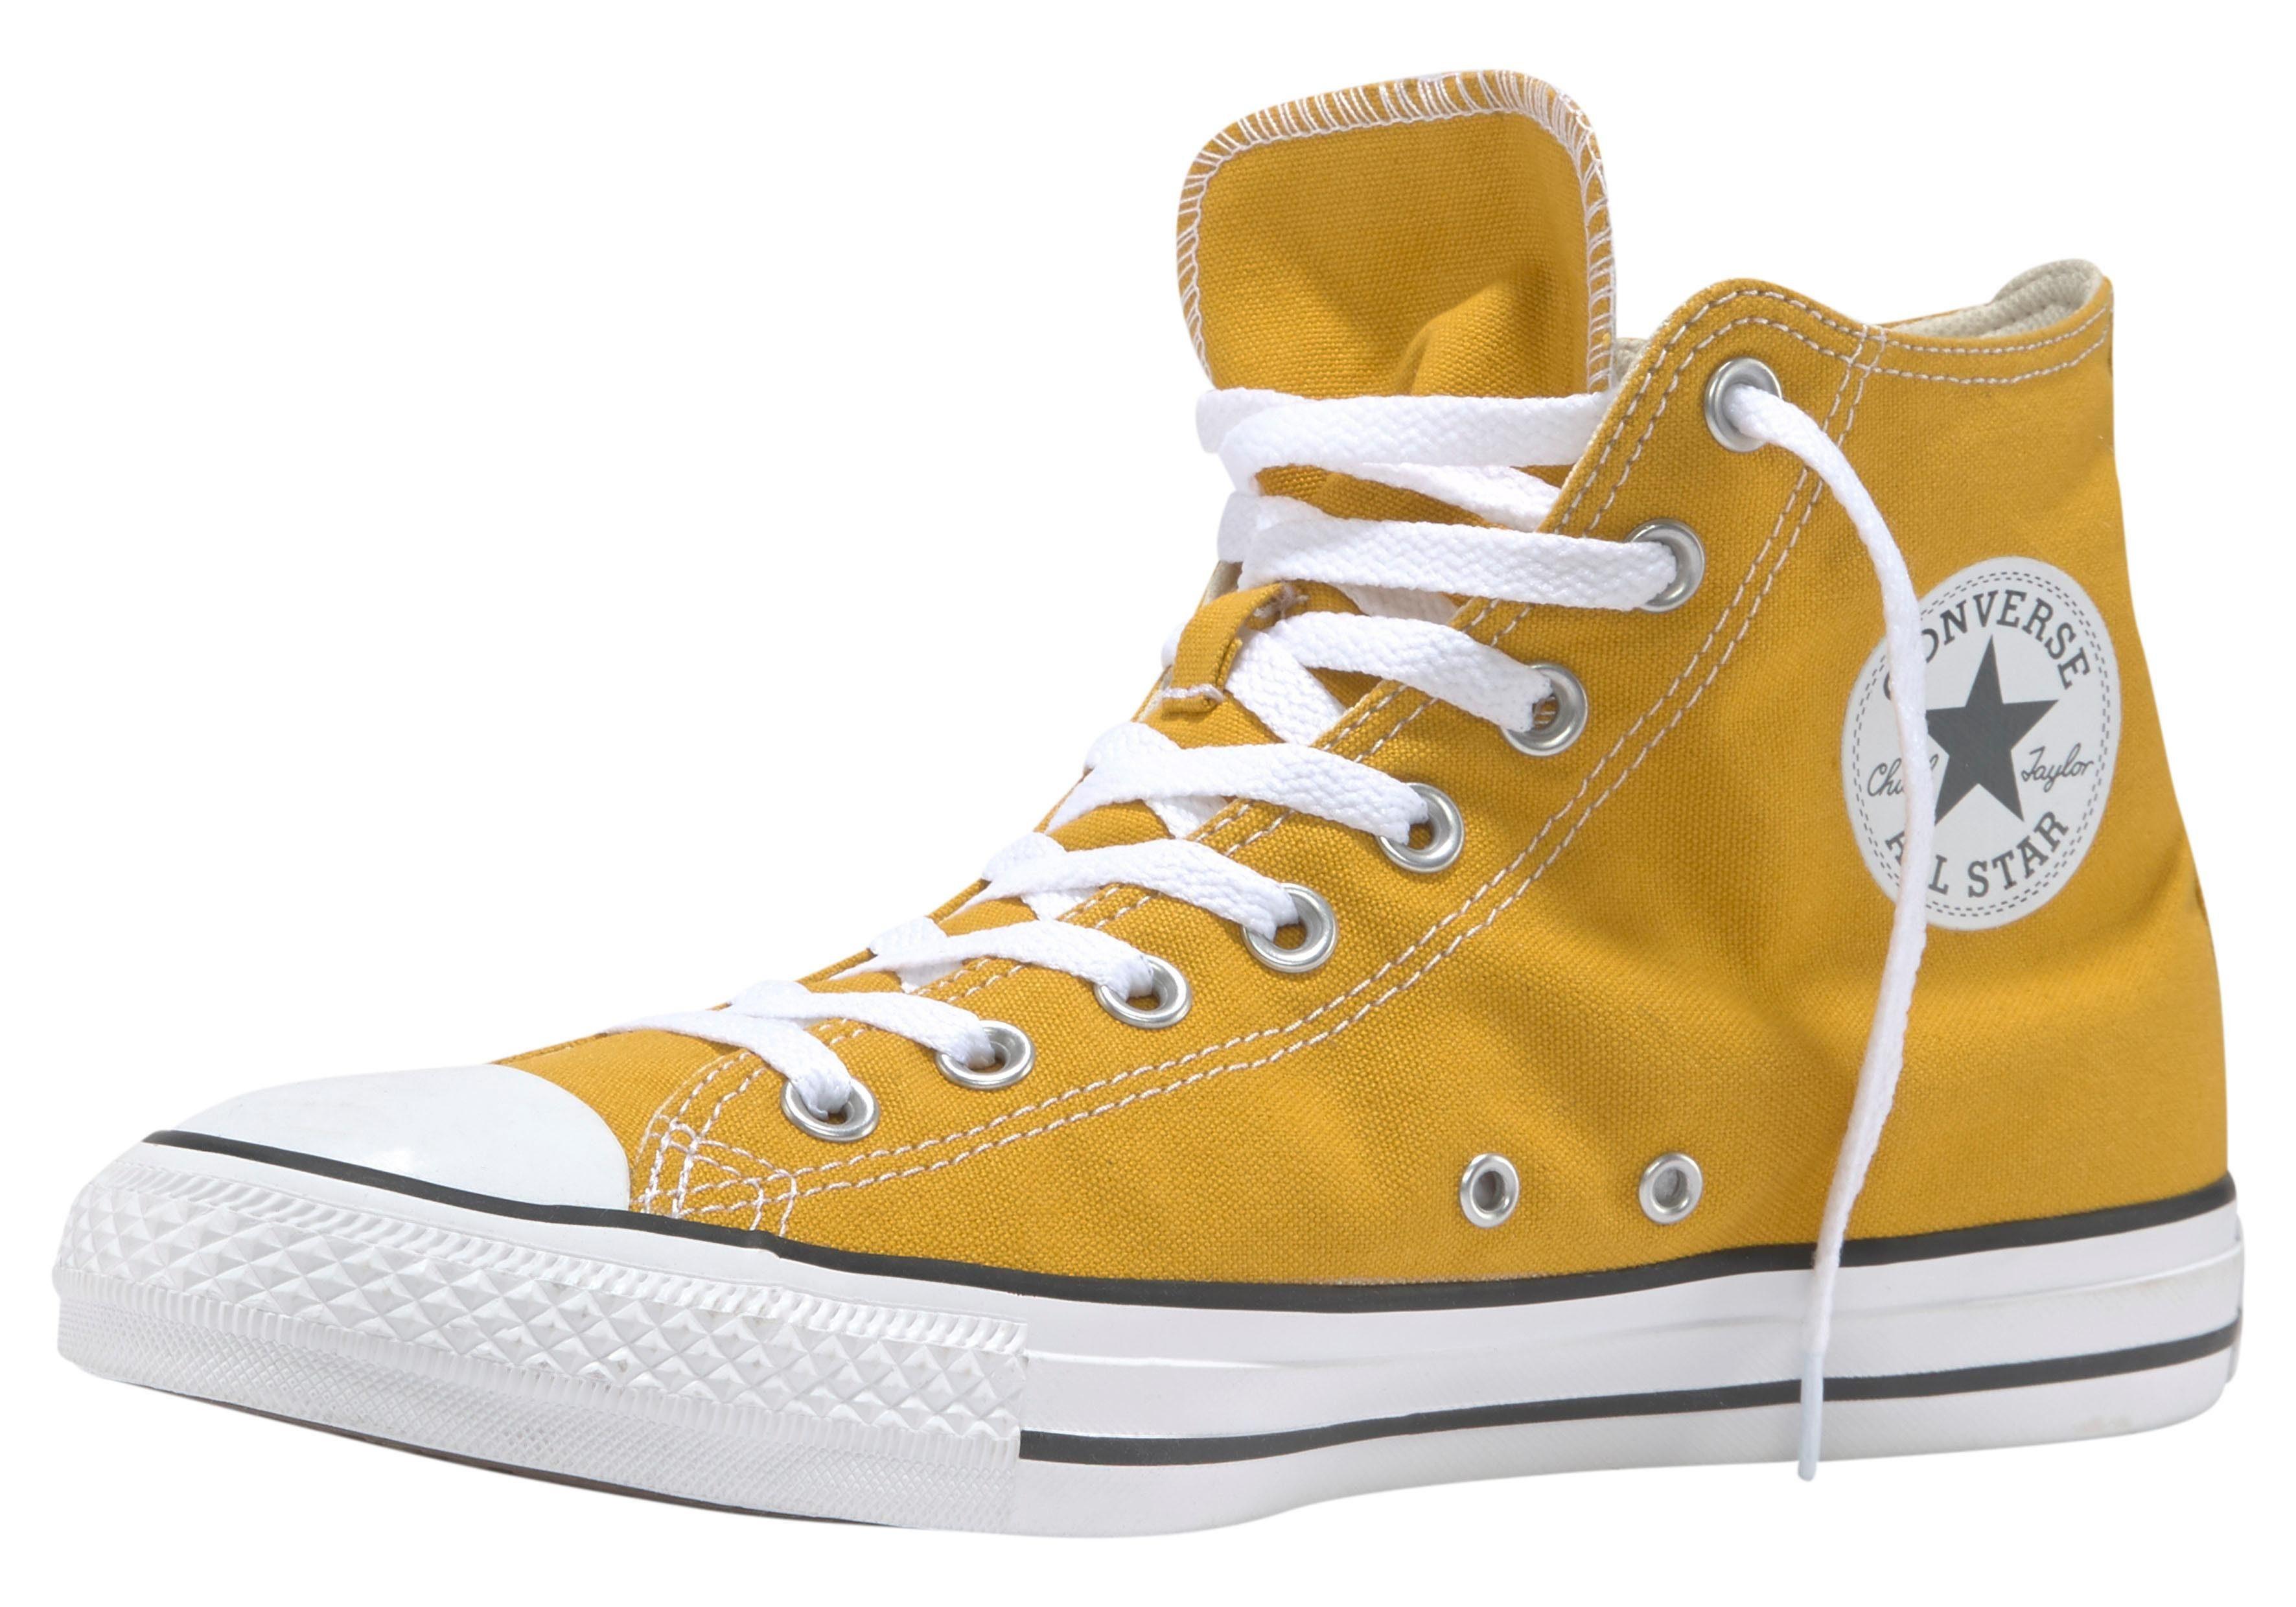 Converse »Chuck Taylor All Star Seasonal Color HI« Sneaker online kaufen | OTTO